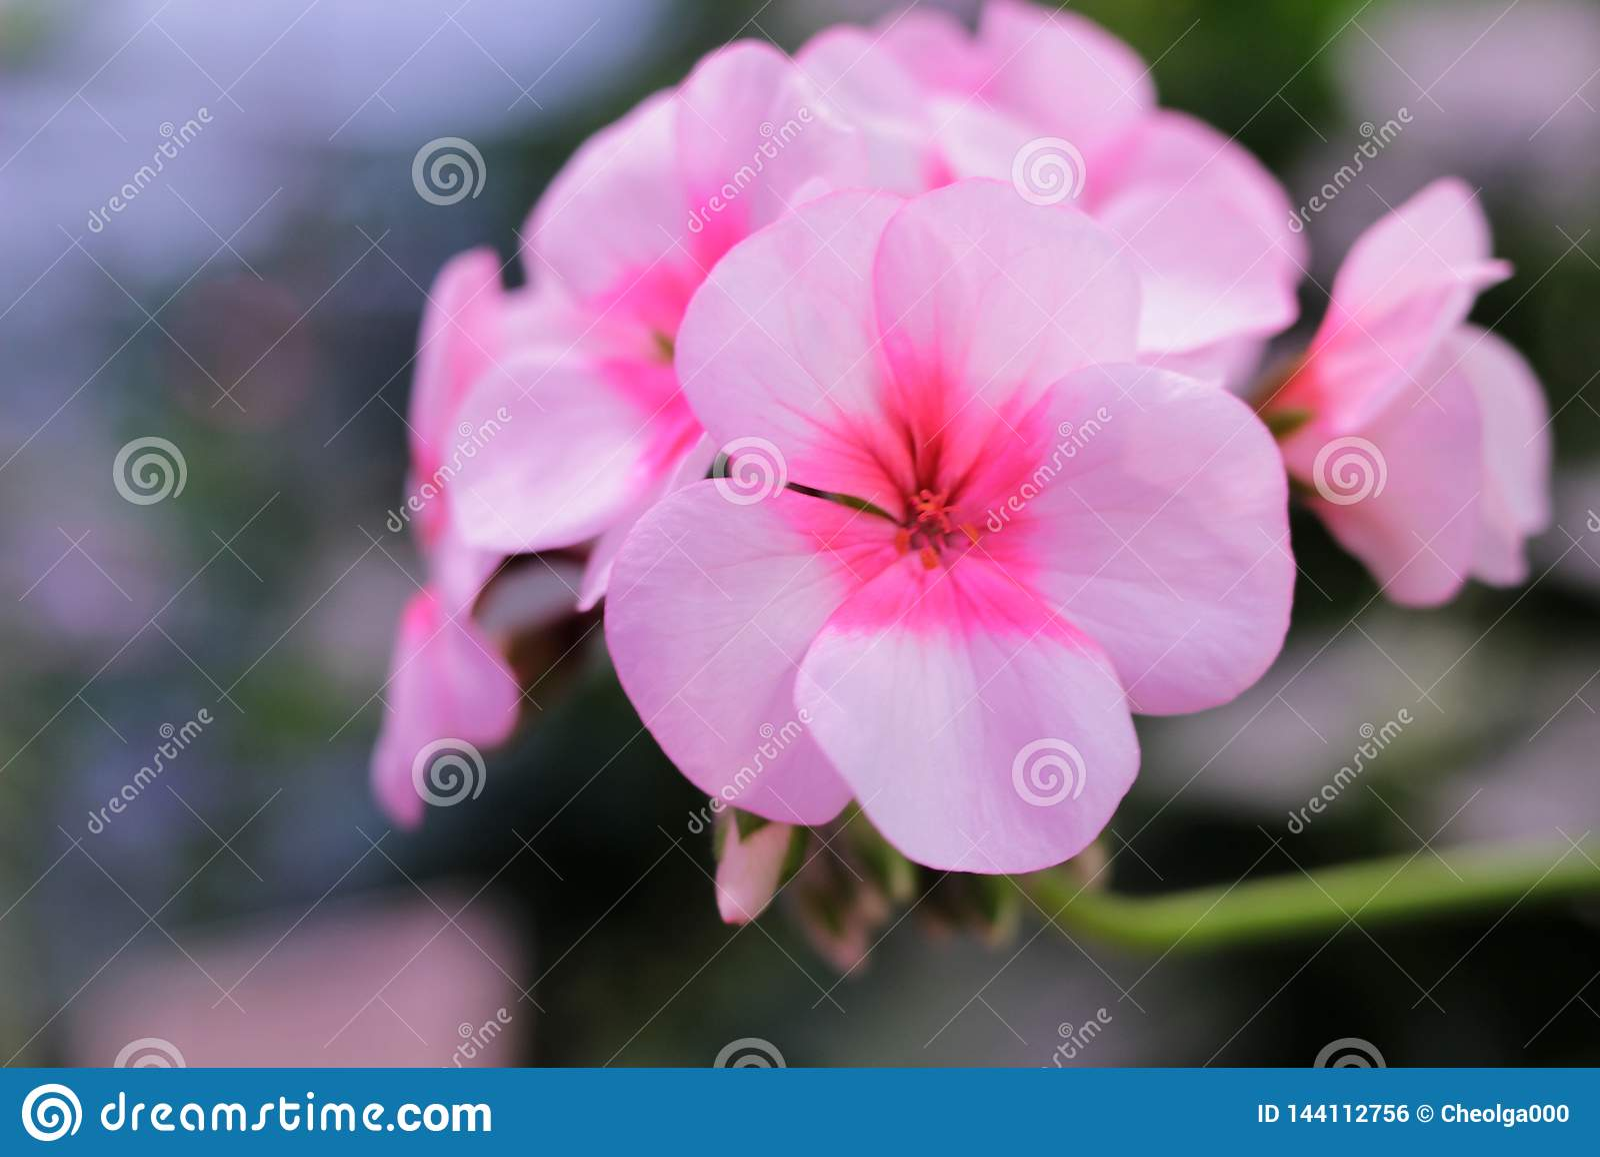 Branch with flowers pink geranium, pelargonium x hortorum L.H. Bale Geraniaceae, flowers postcard, copy space